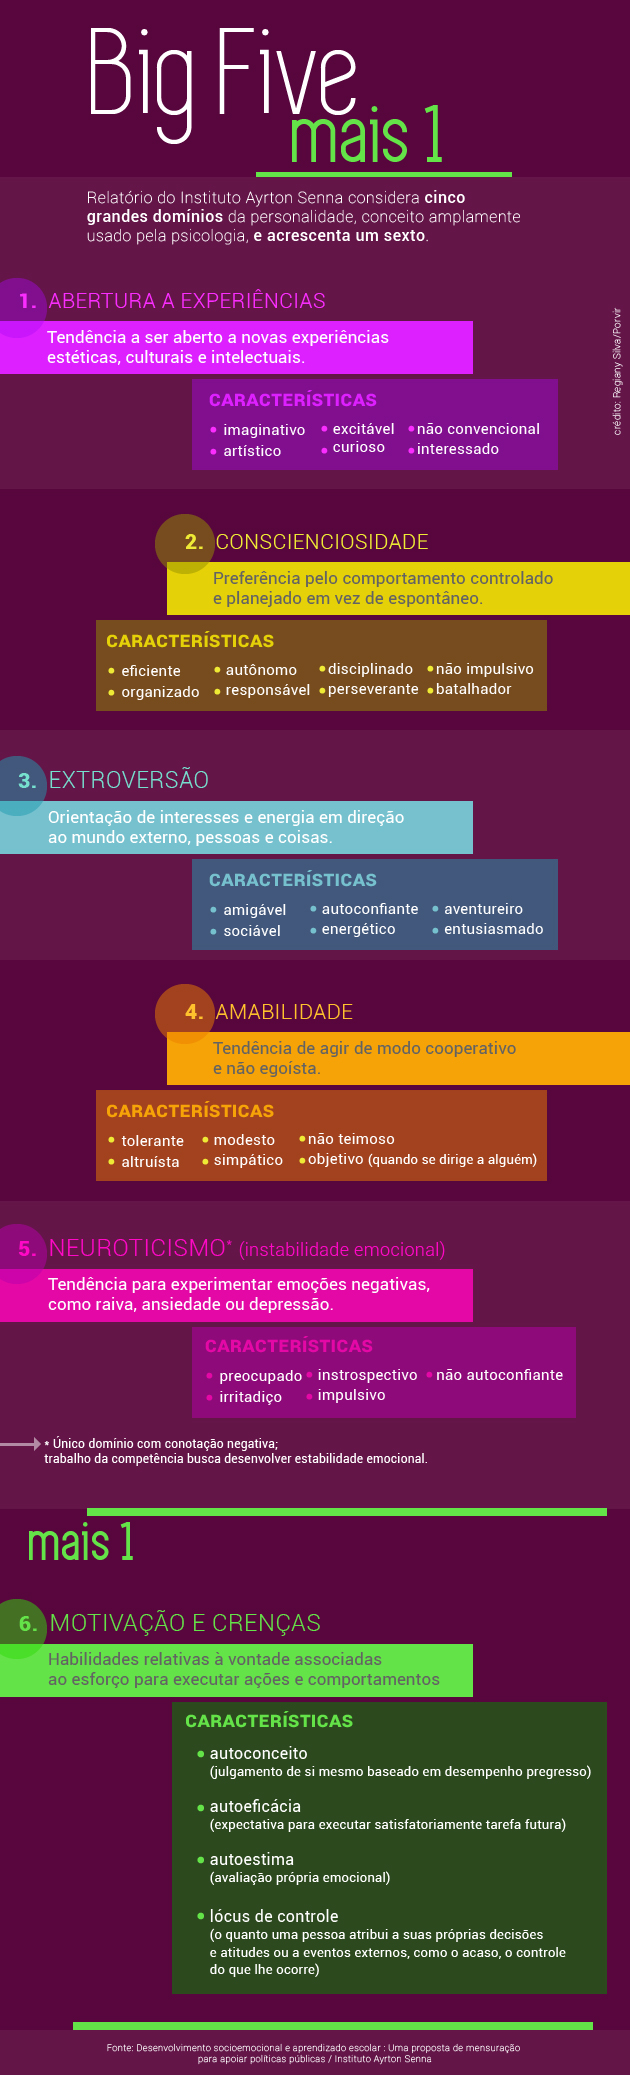 Infográfico pesquisa Instituto Ayrton Senna